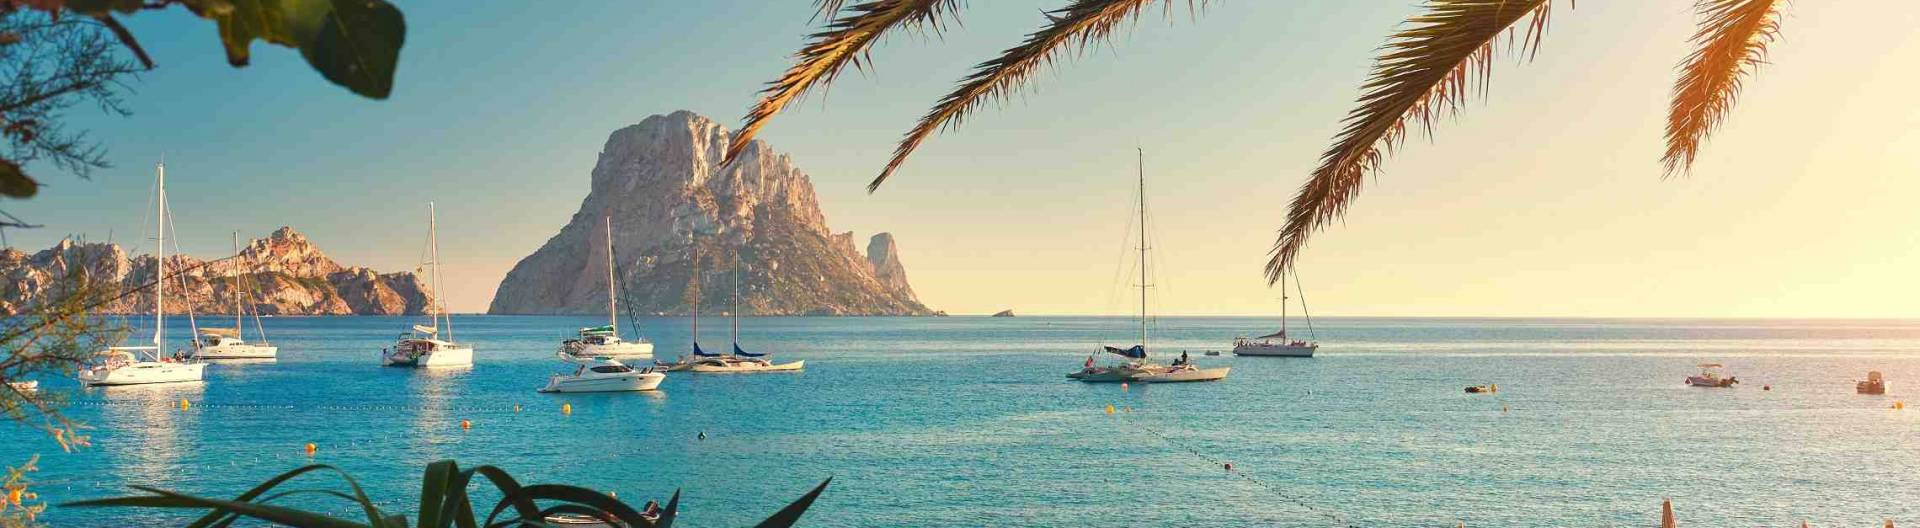 Espanja-Baleaarit-Ibiza-ranta-maisema-1920x528.jpg